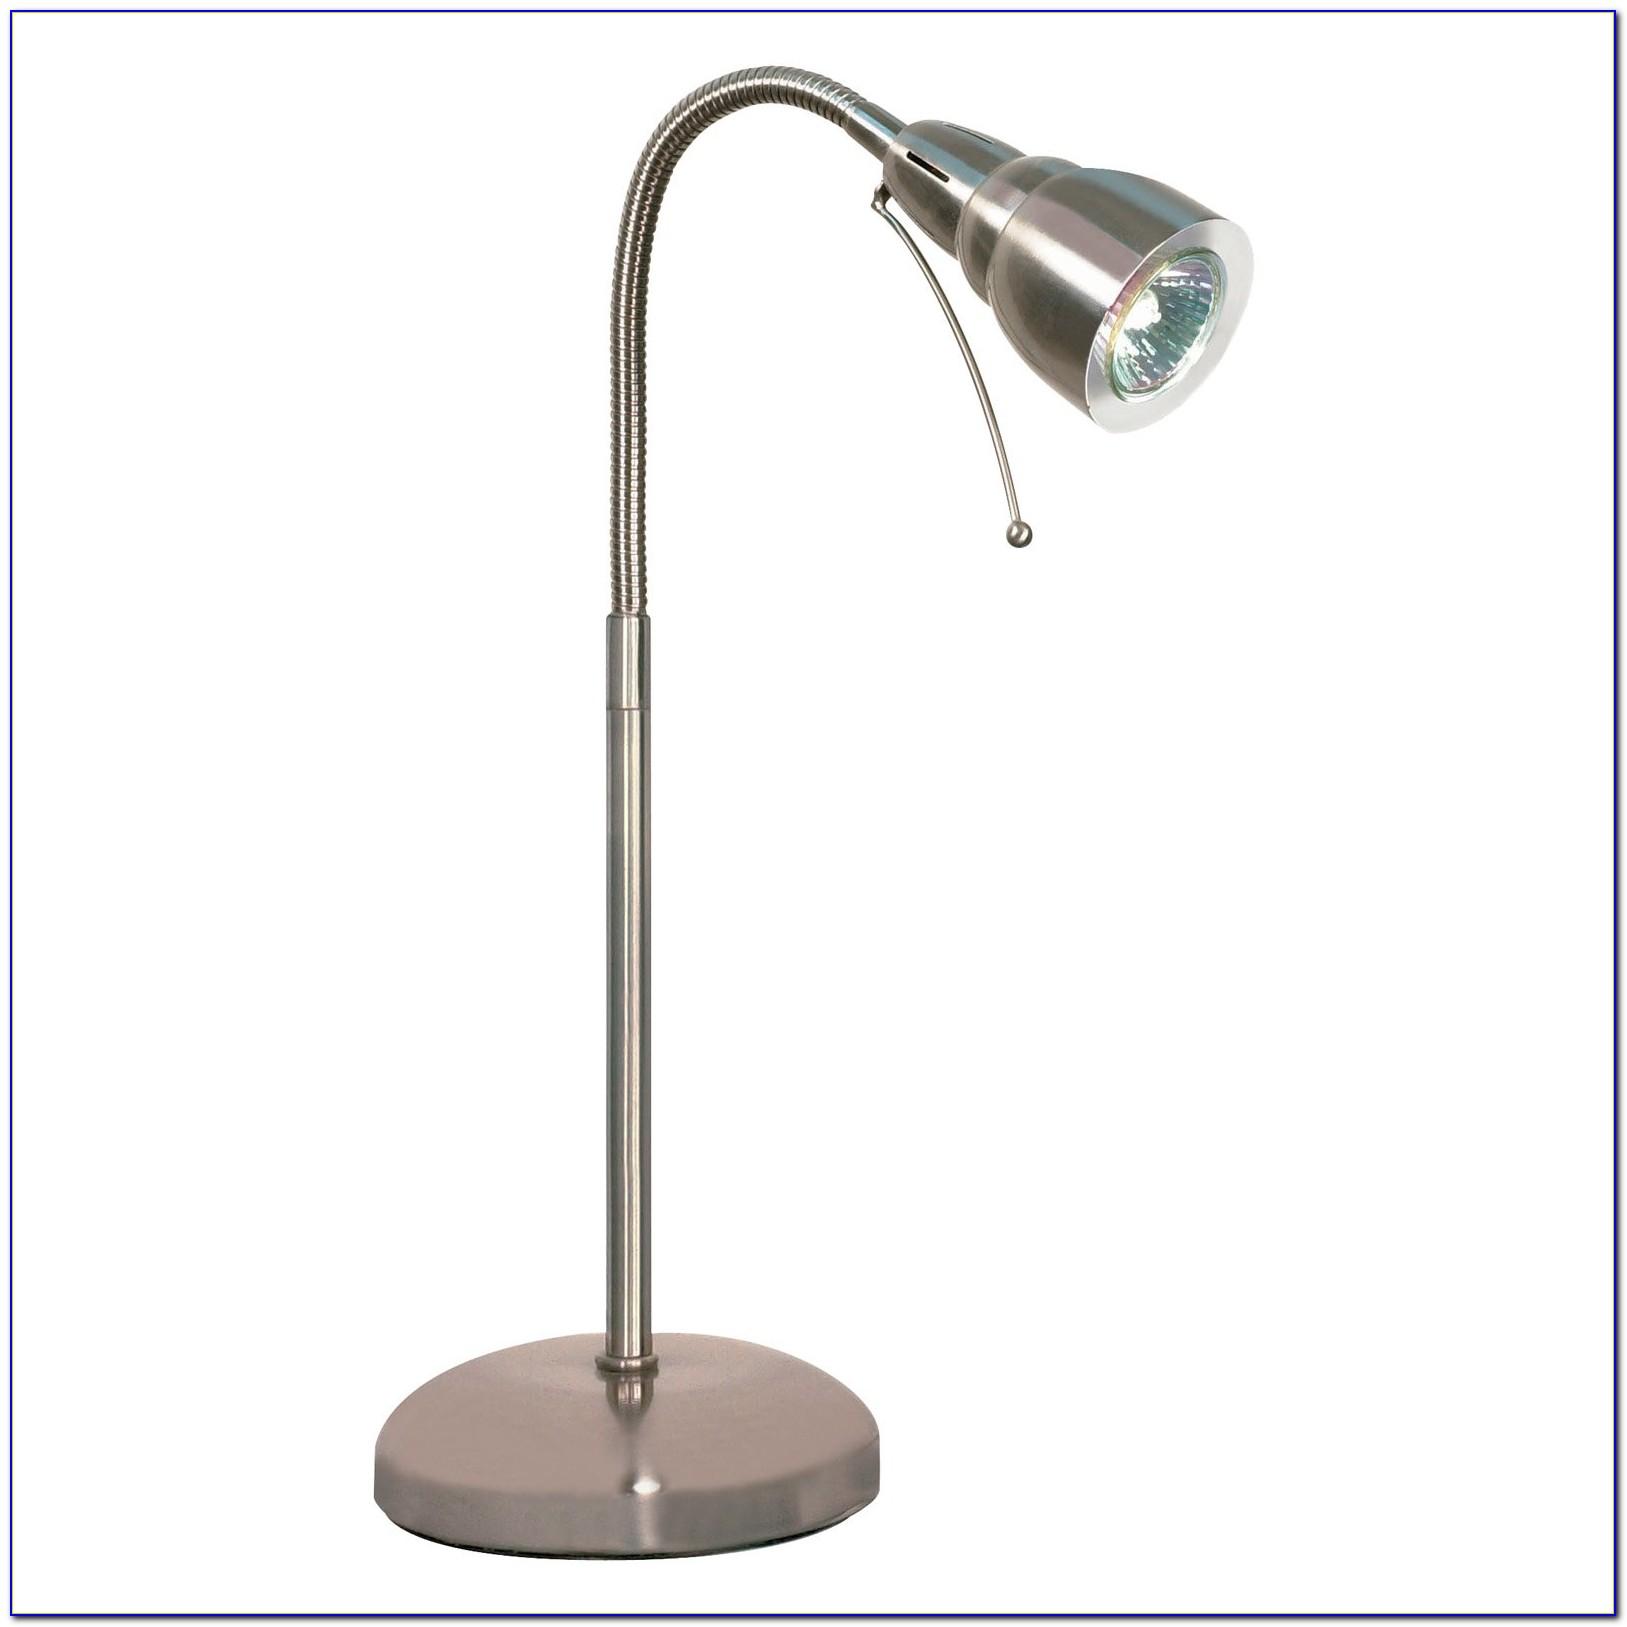 Gooseneck Halogen Desk Lamp